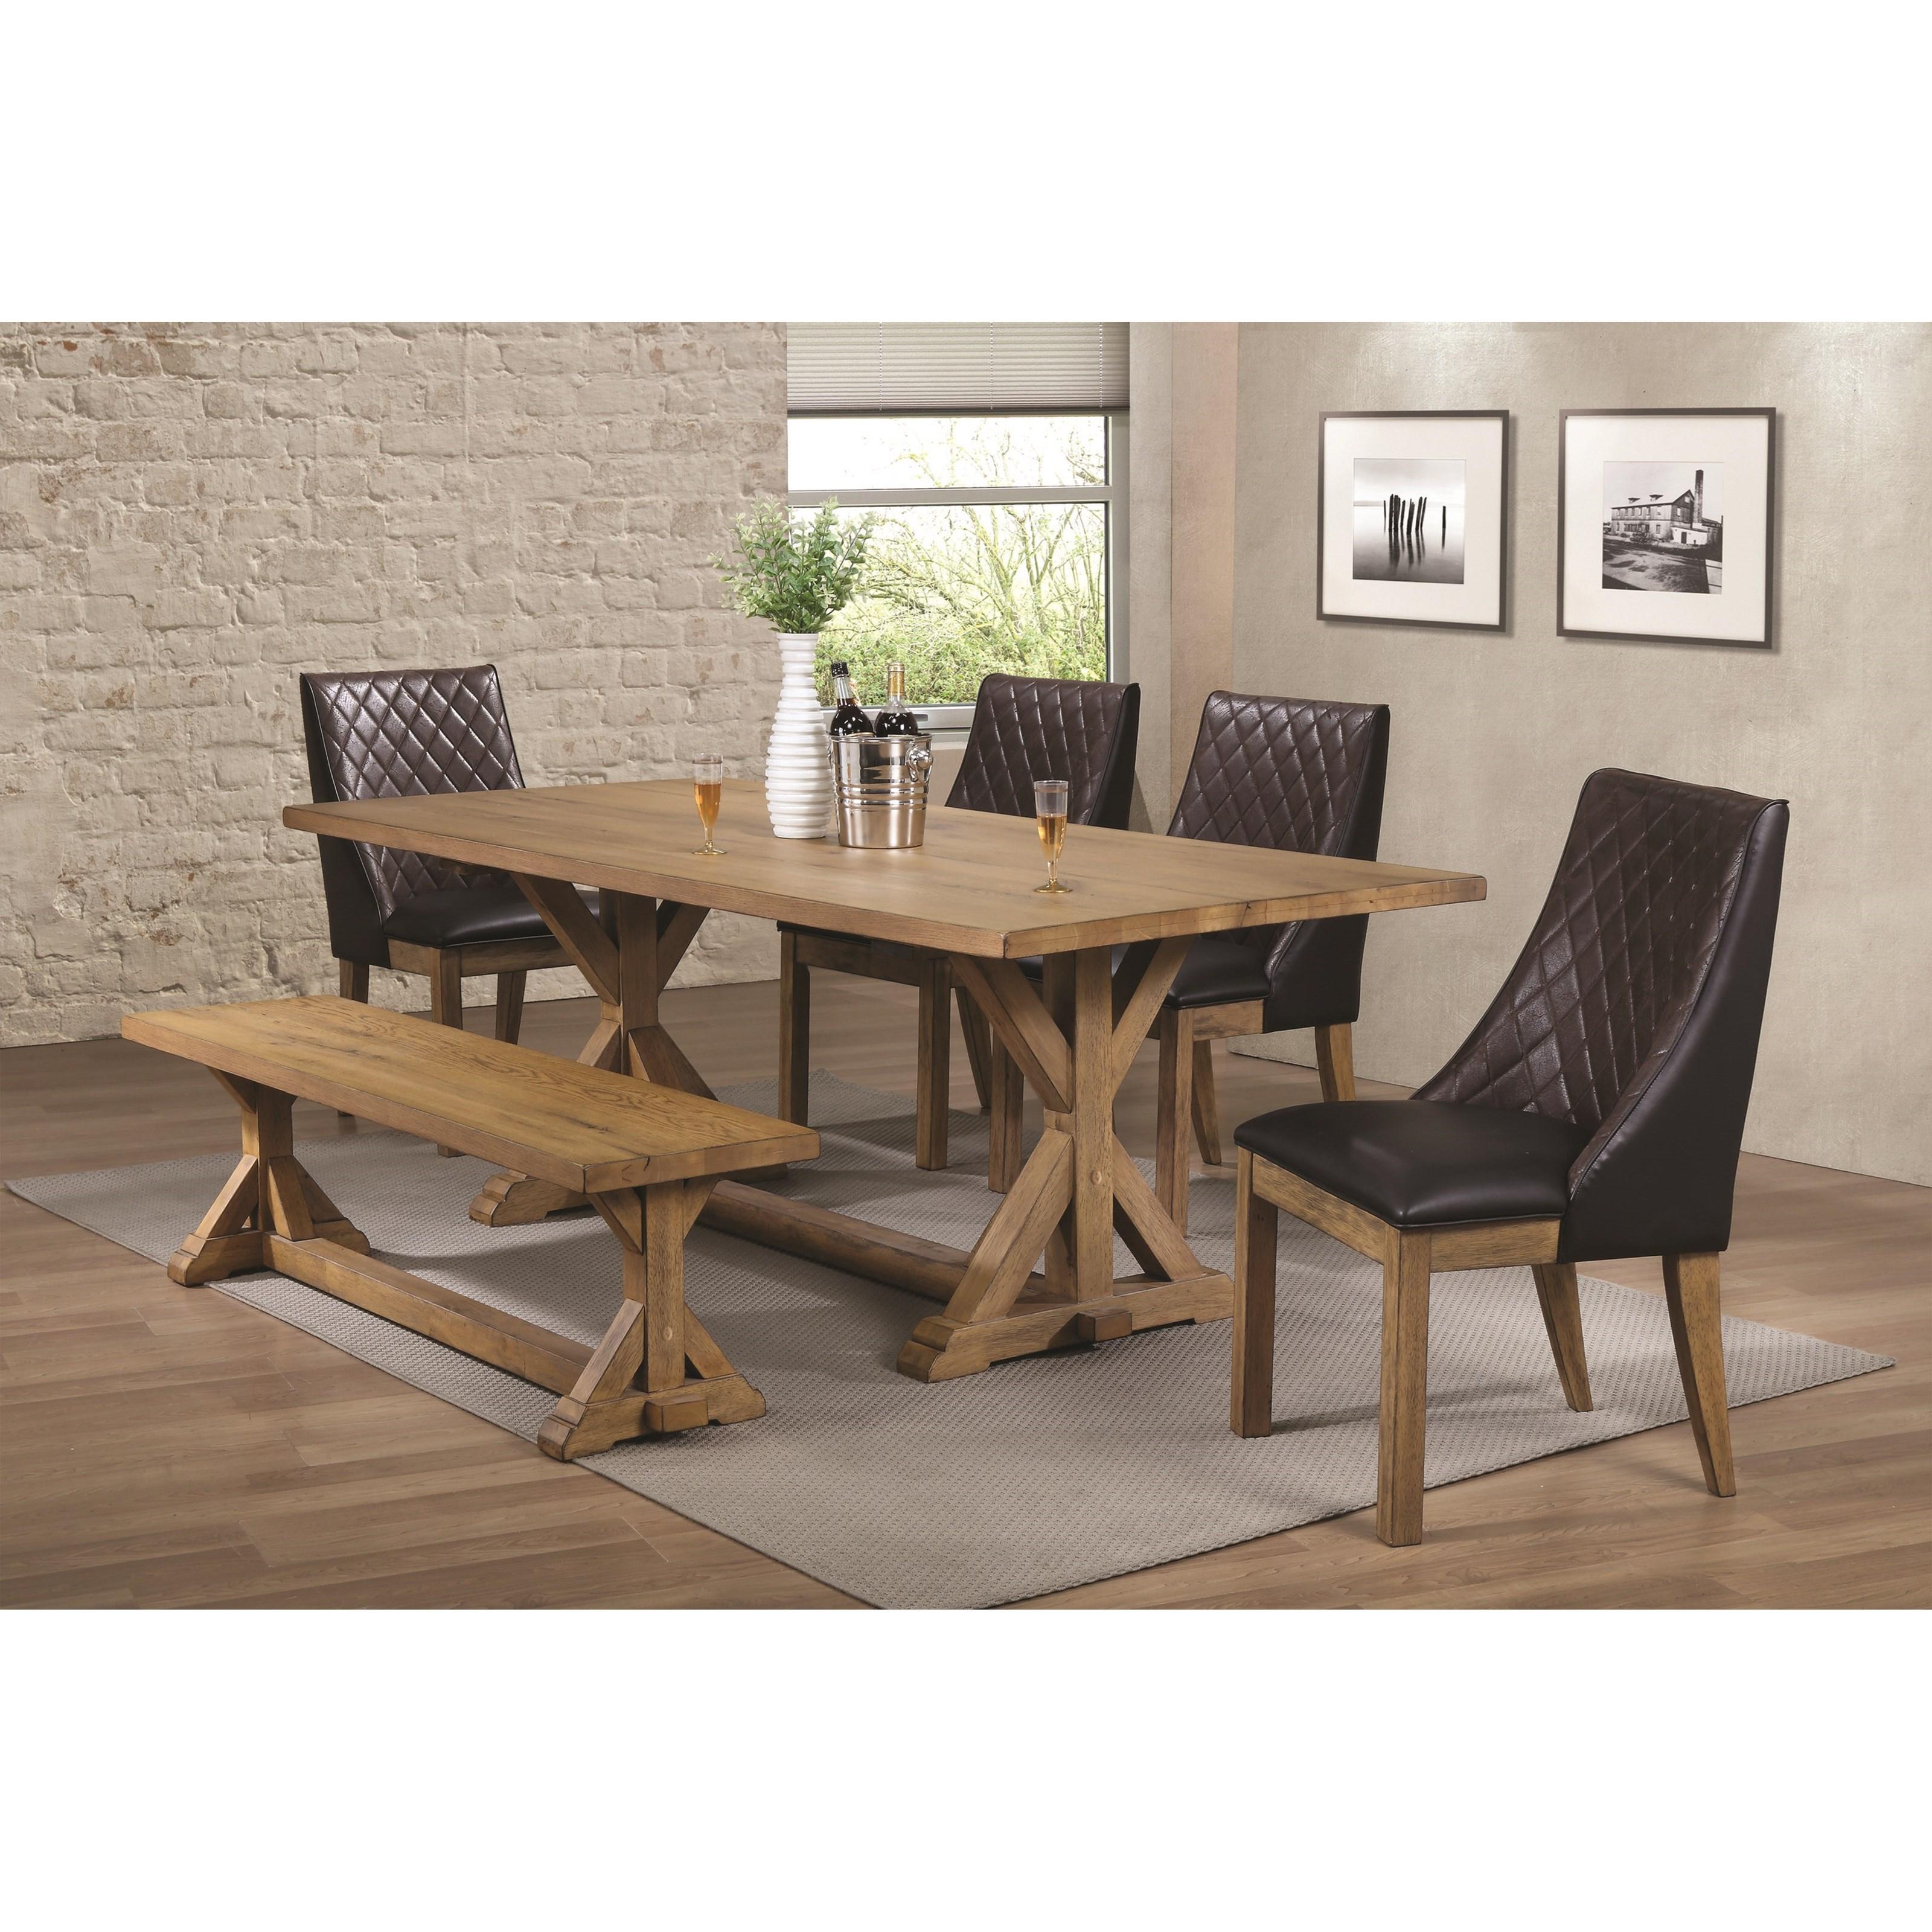 Coaster DouglasDining Table Set With Bench ...